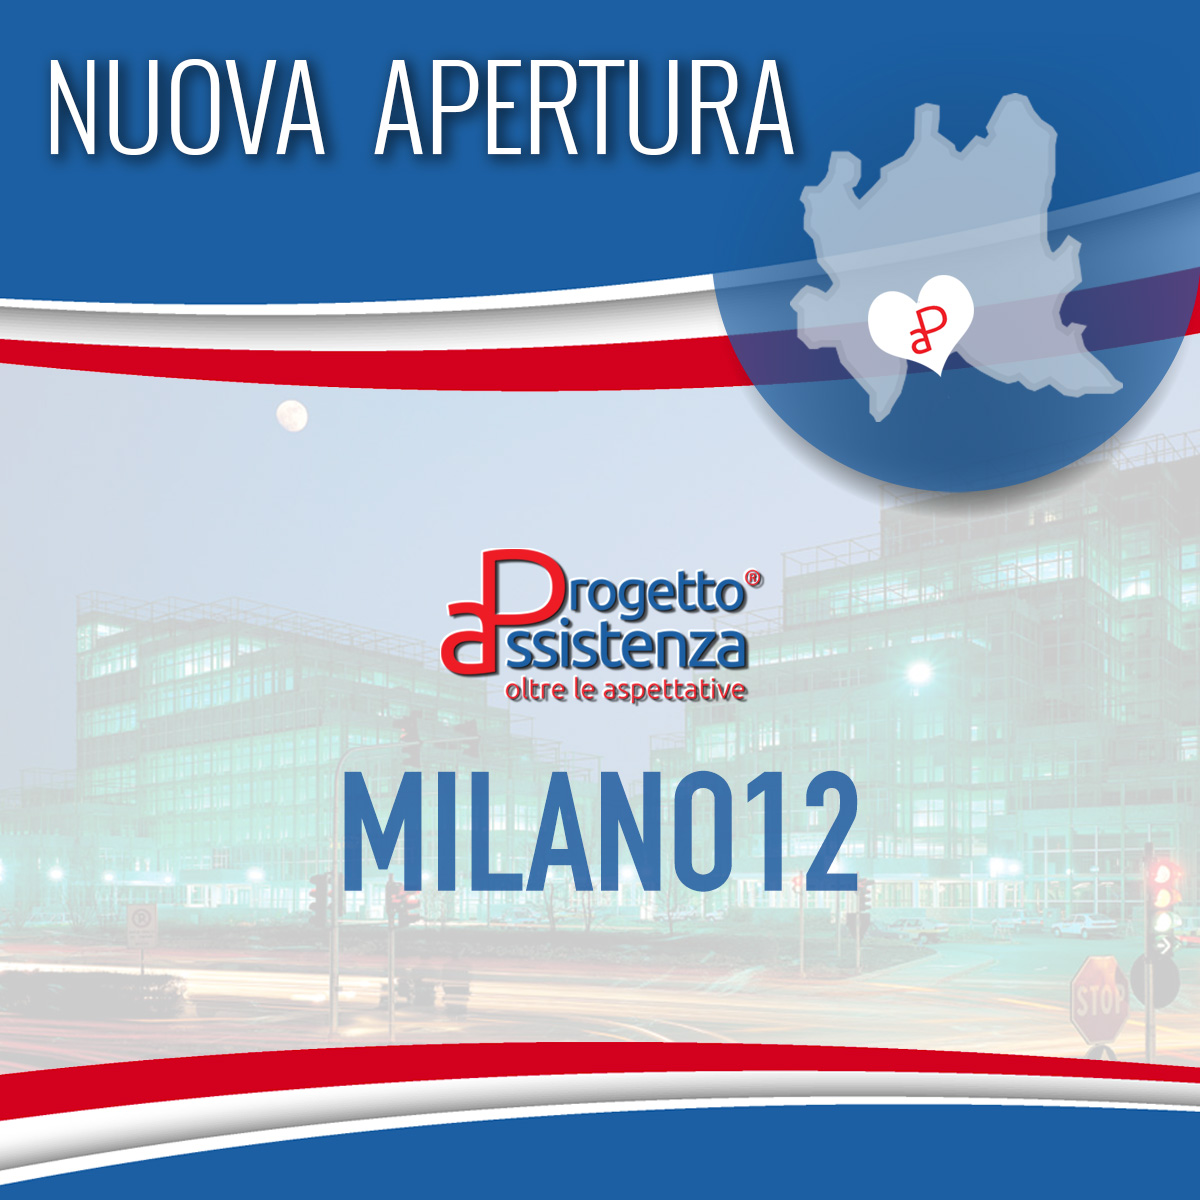 Nuova Apertura: Milano12